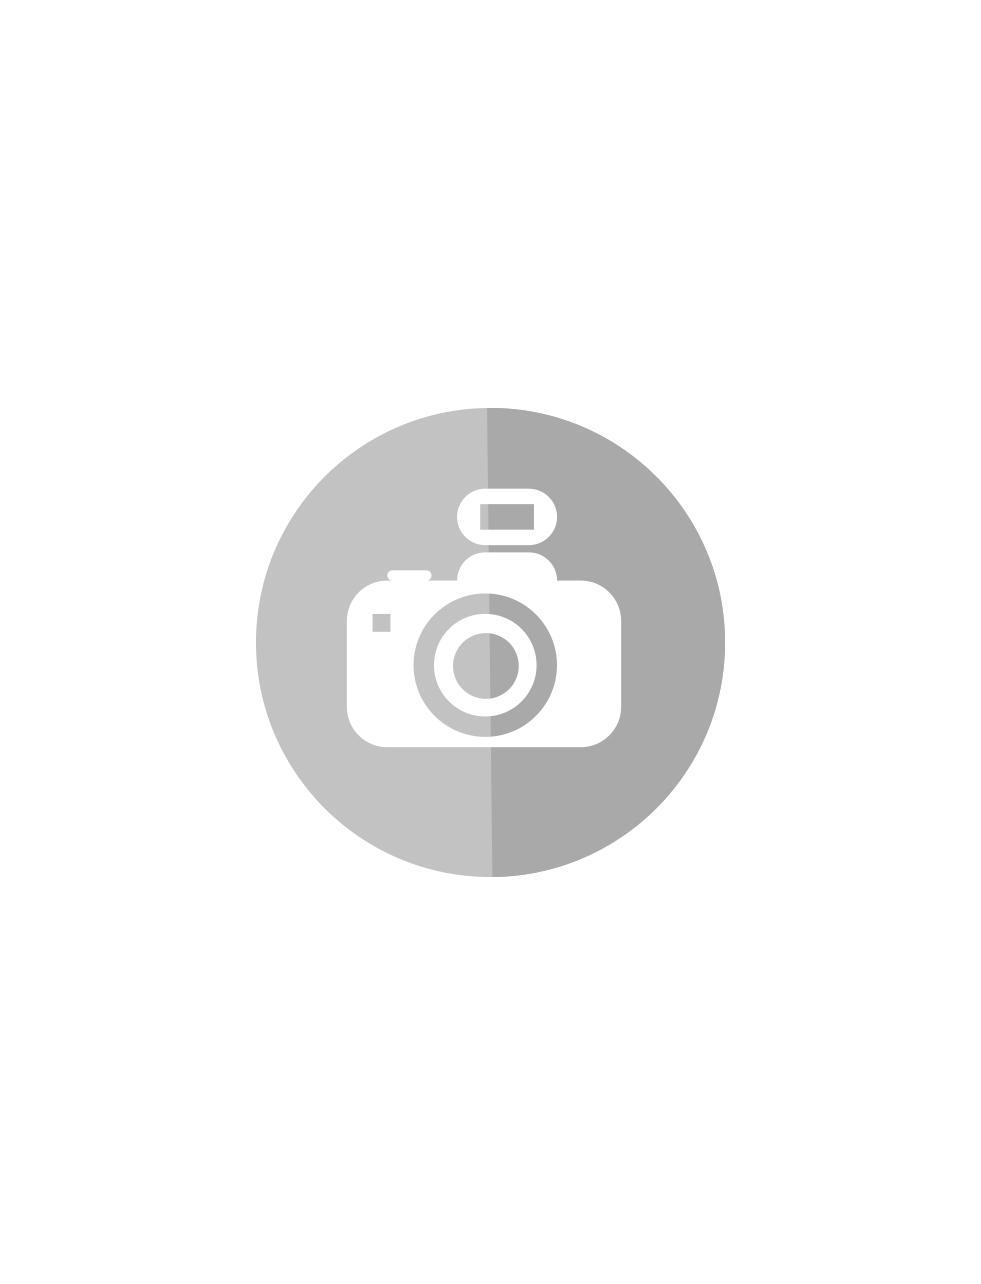 60642940_sparepart/CHEST:APPLES II 2995-2996